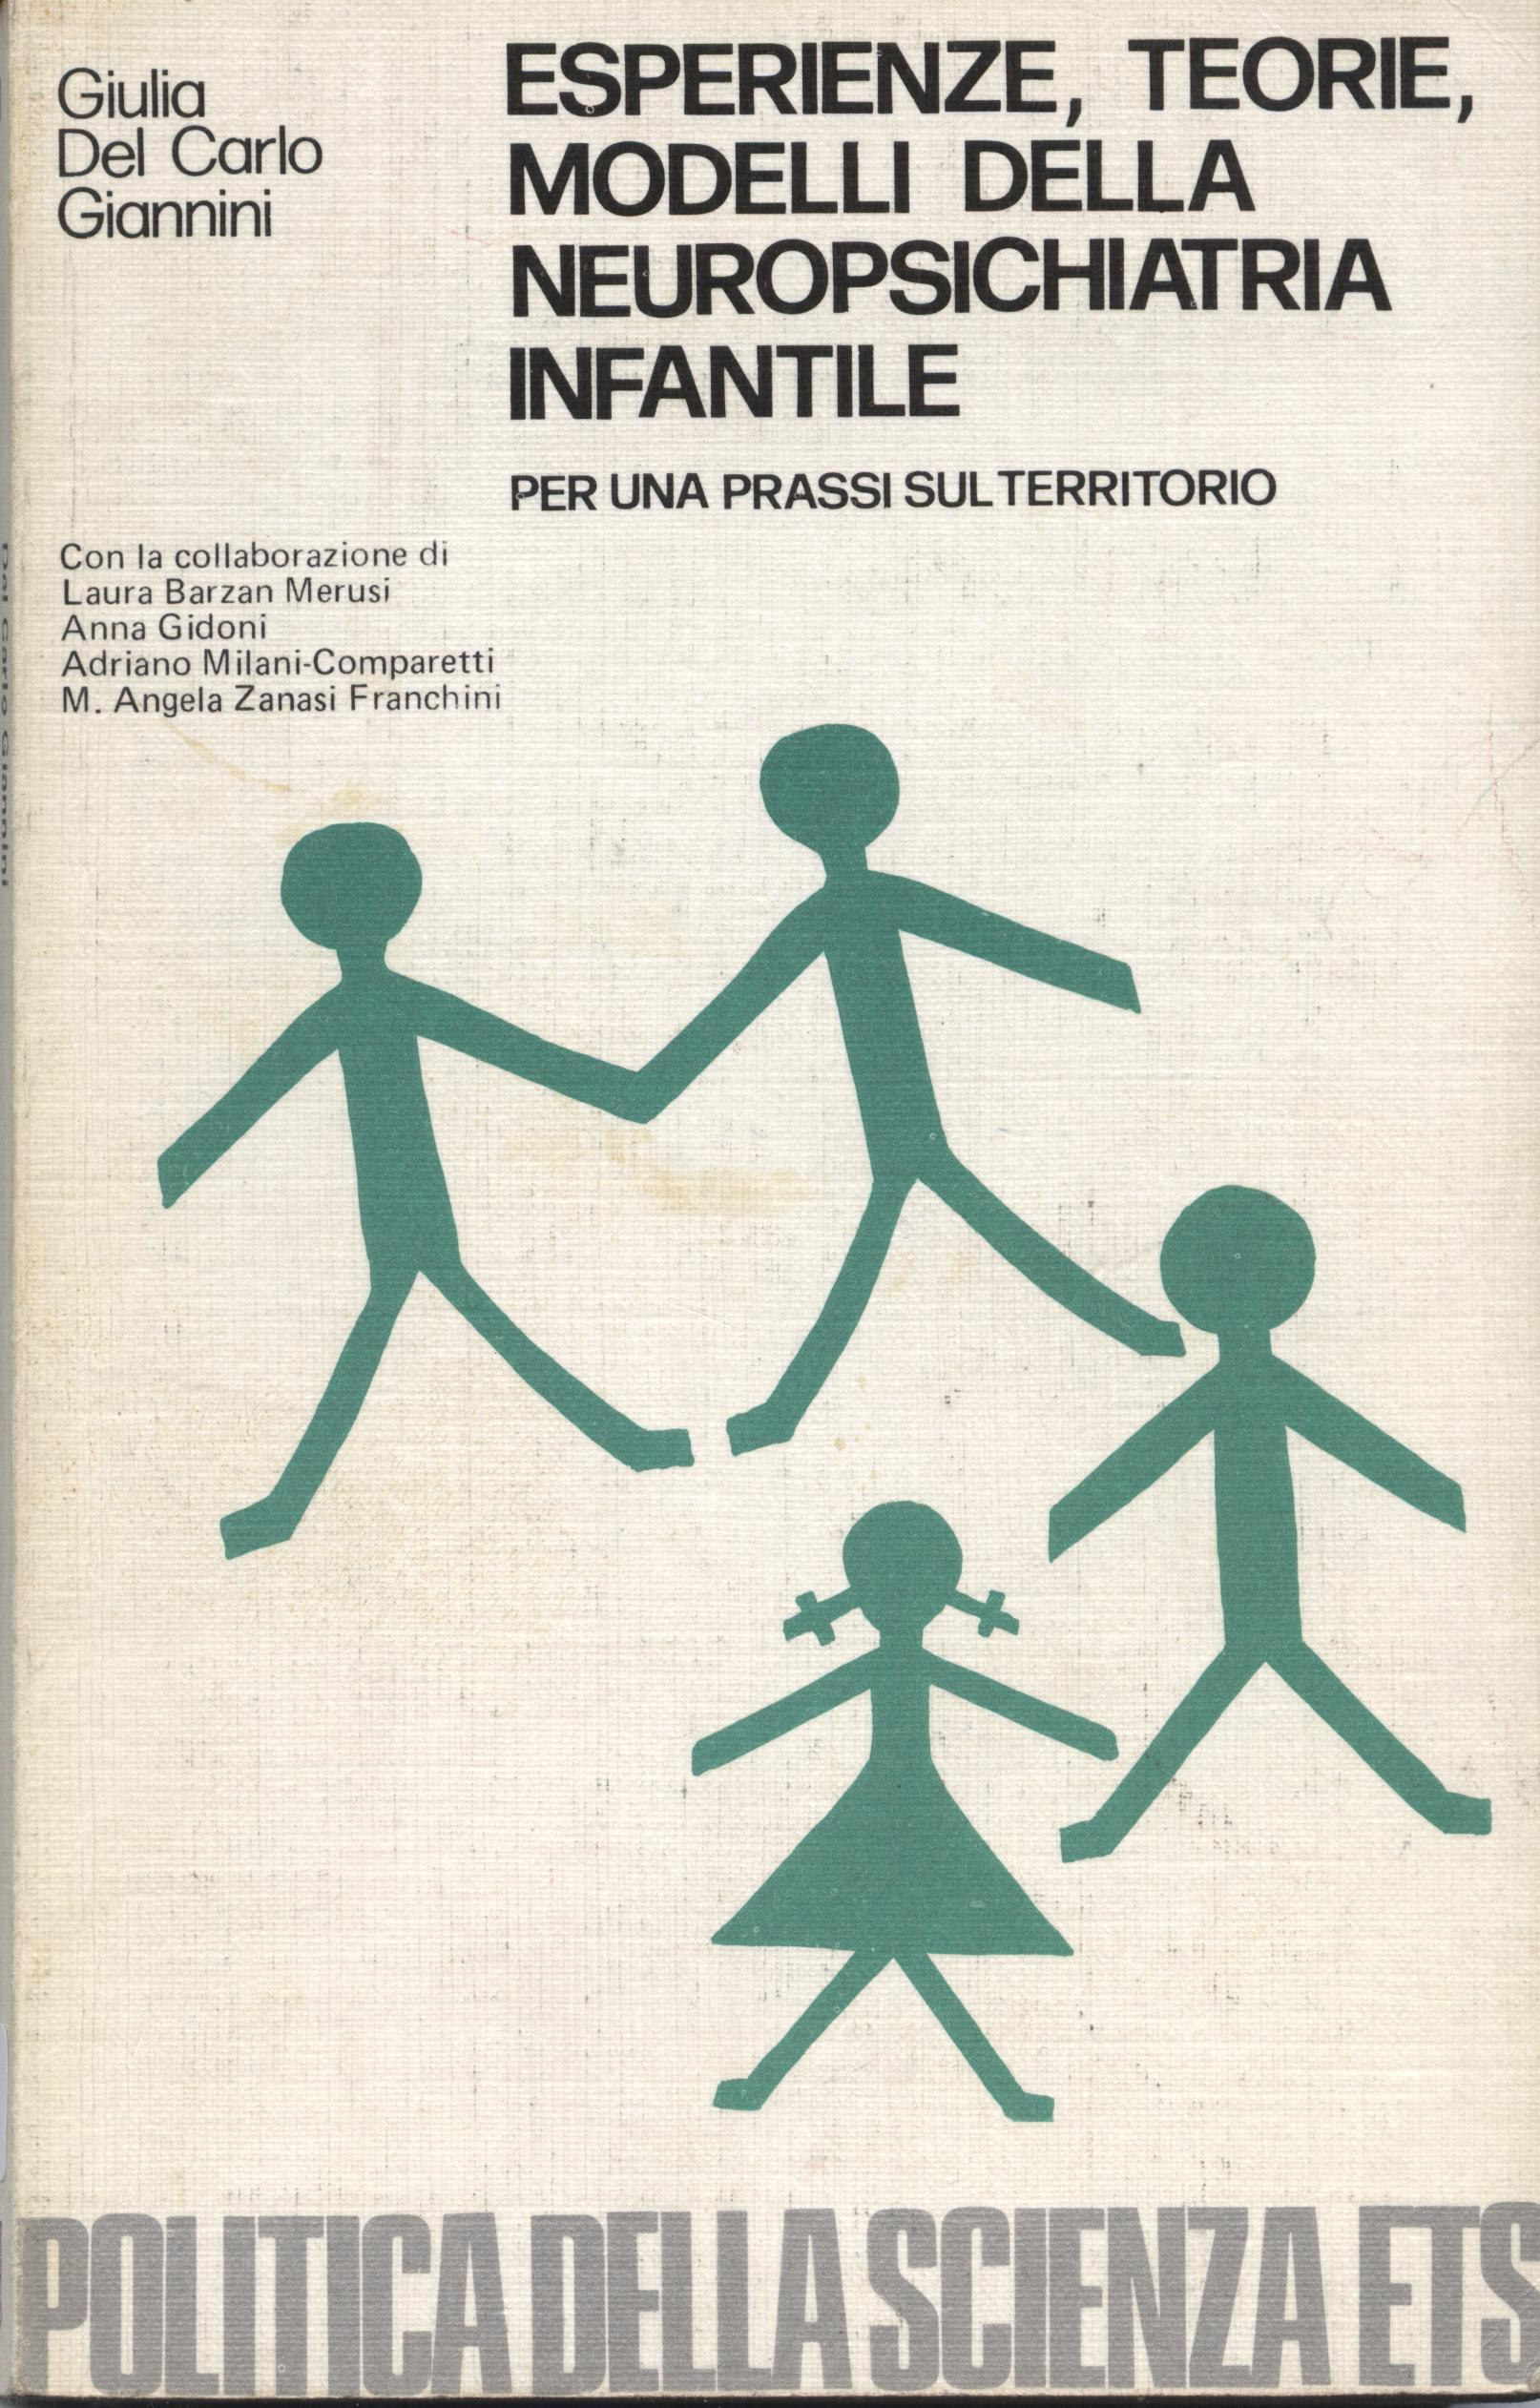 Esperienze, teorie, modelli della neuropsichiatria infantile